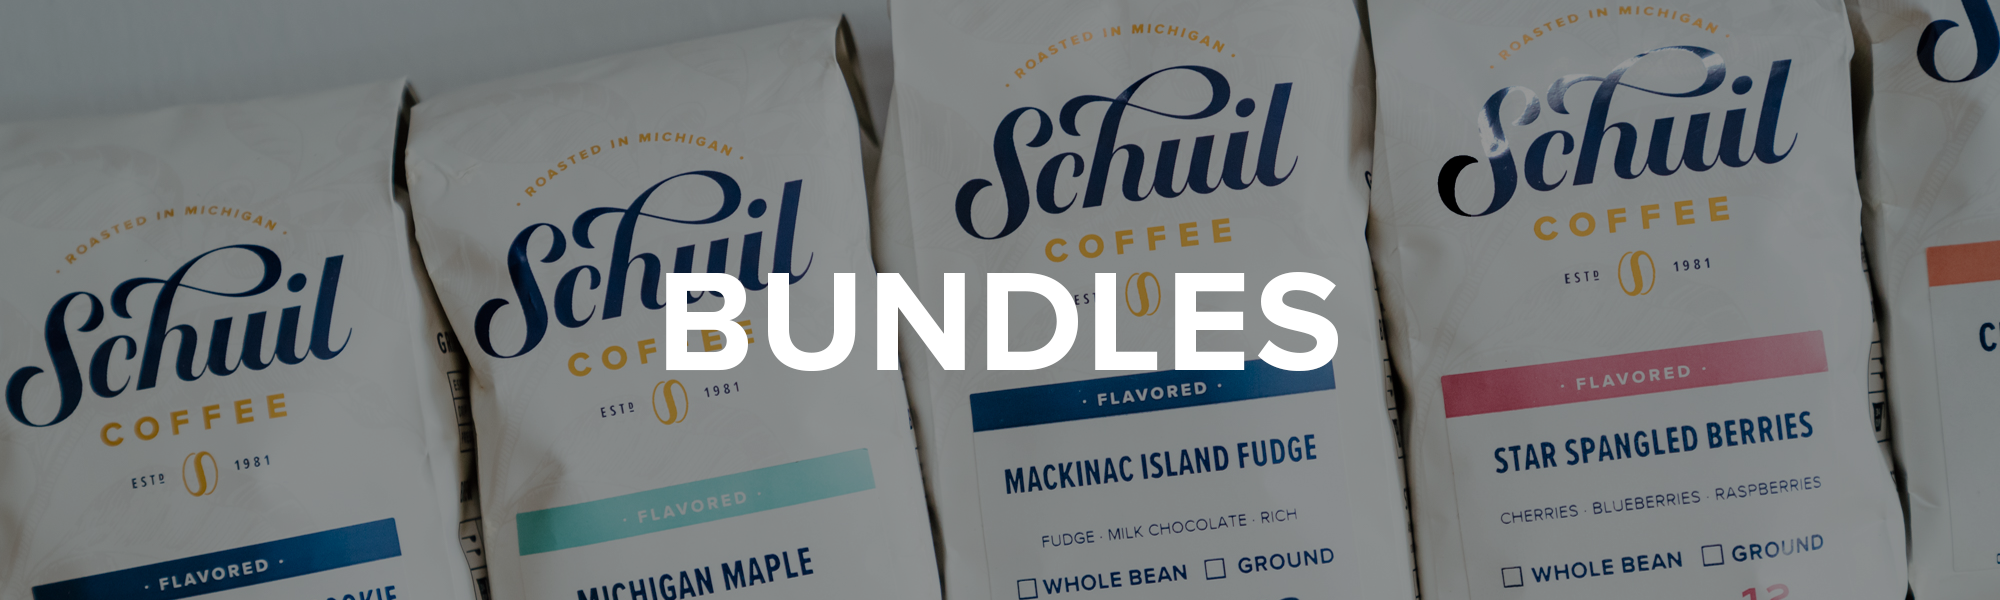 Schuil Coffee Bundles